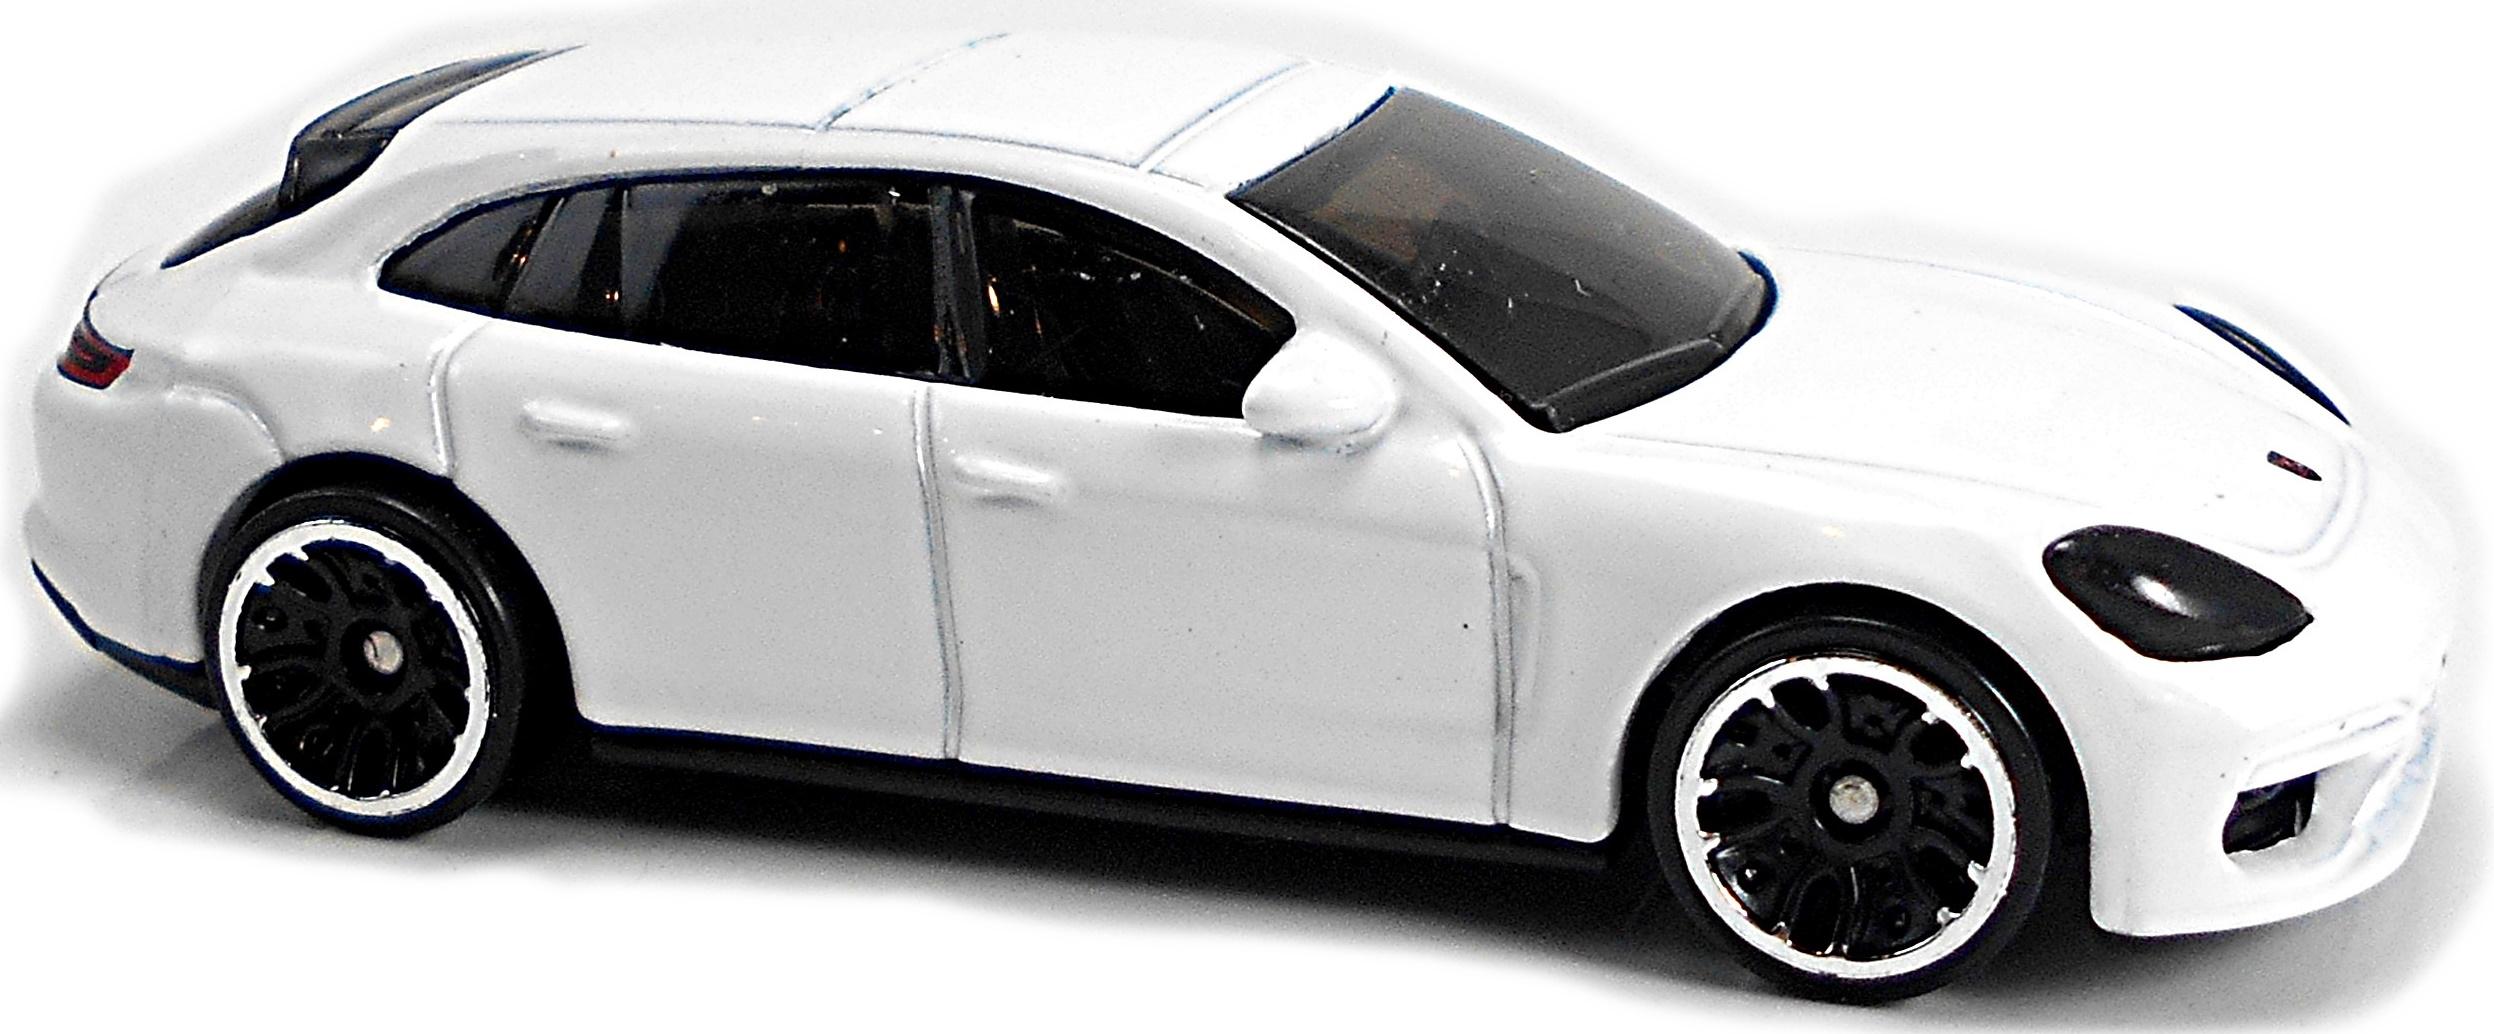 Porsche Panamera Turbo S E Hybrid Sport Turismo B Hot Wheels Newsletterhot Wheels Newsletter